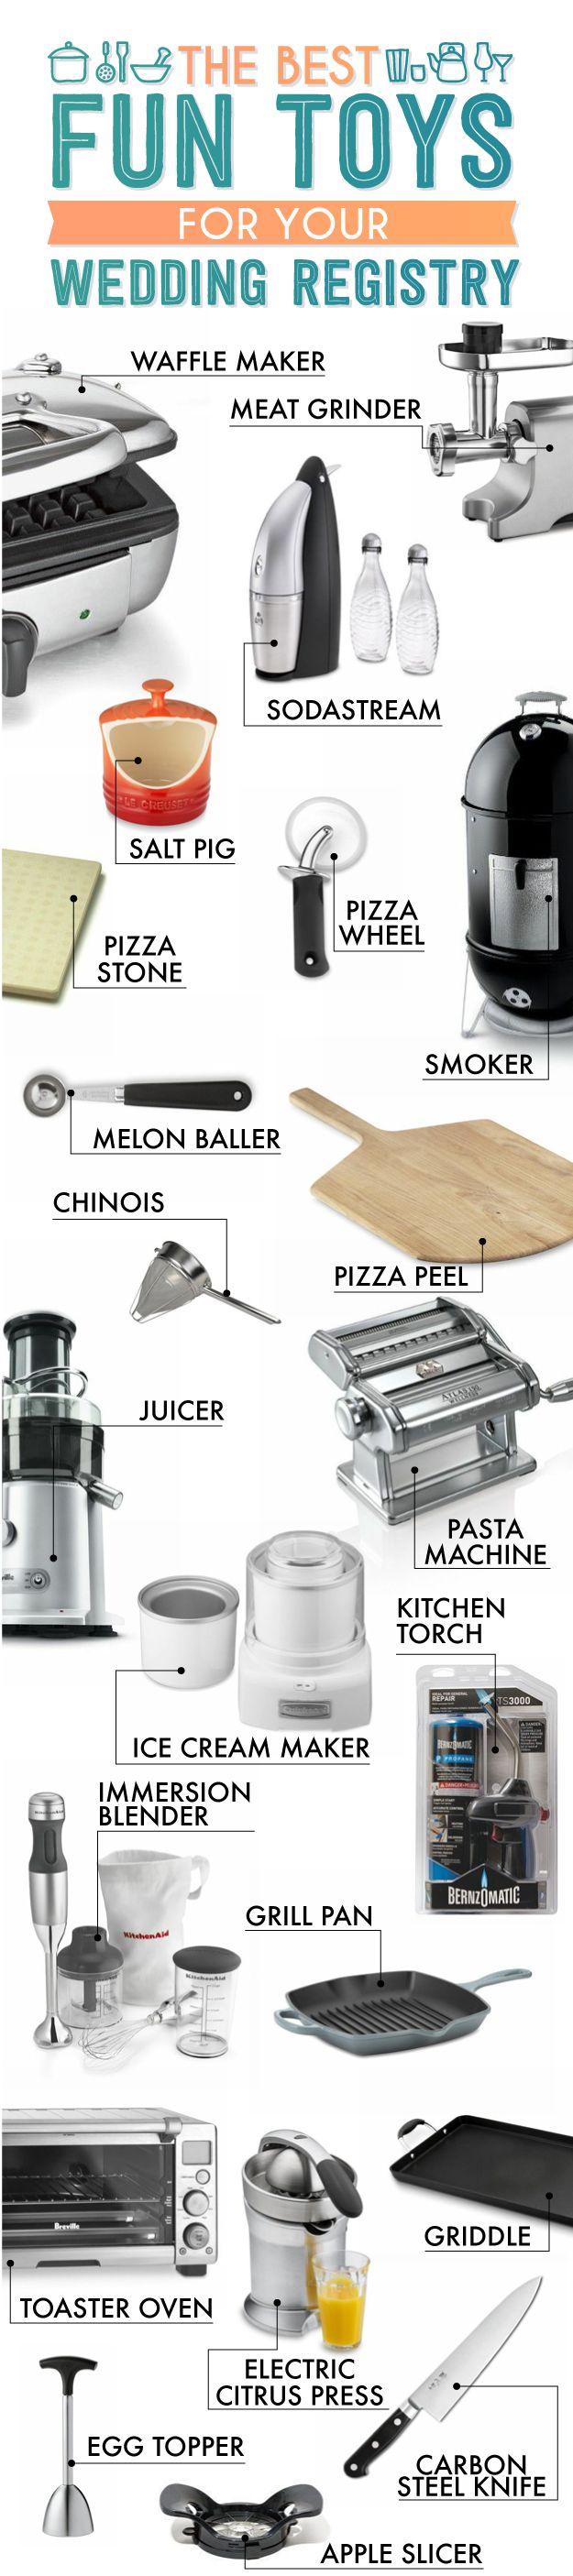 The Essential Wedding Registry Checklist For Your Kitchen